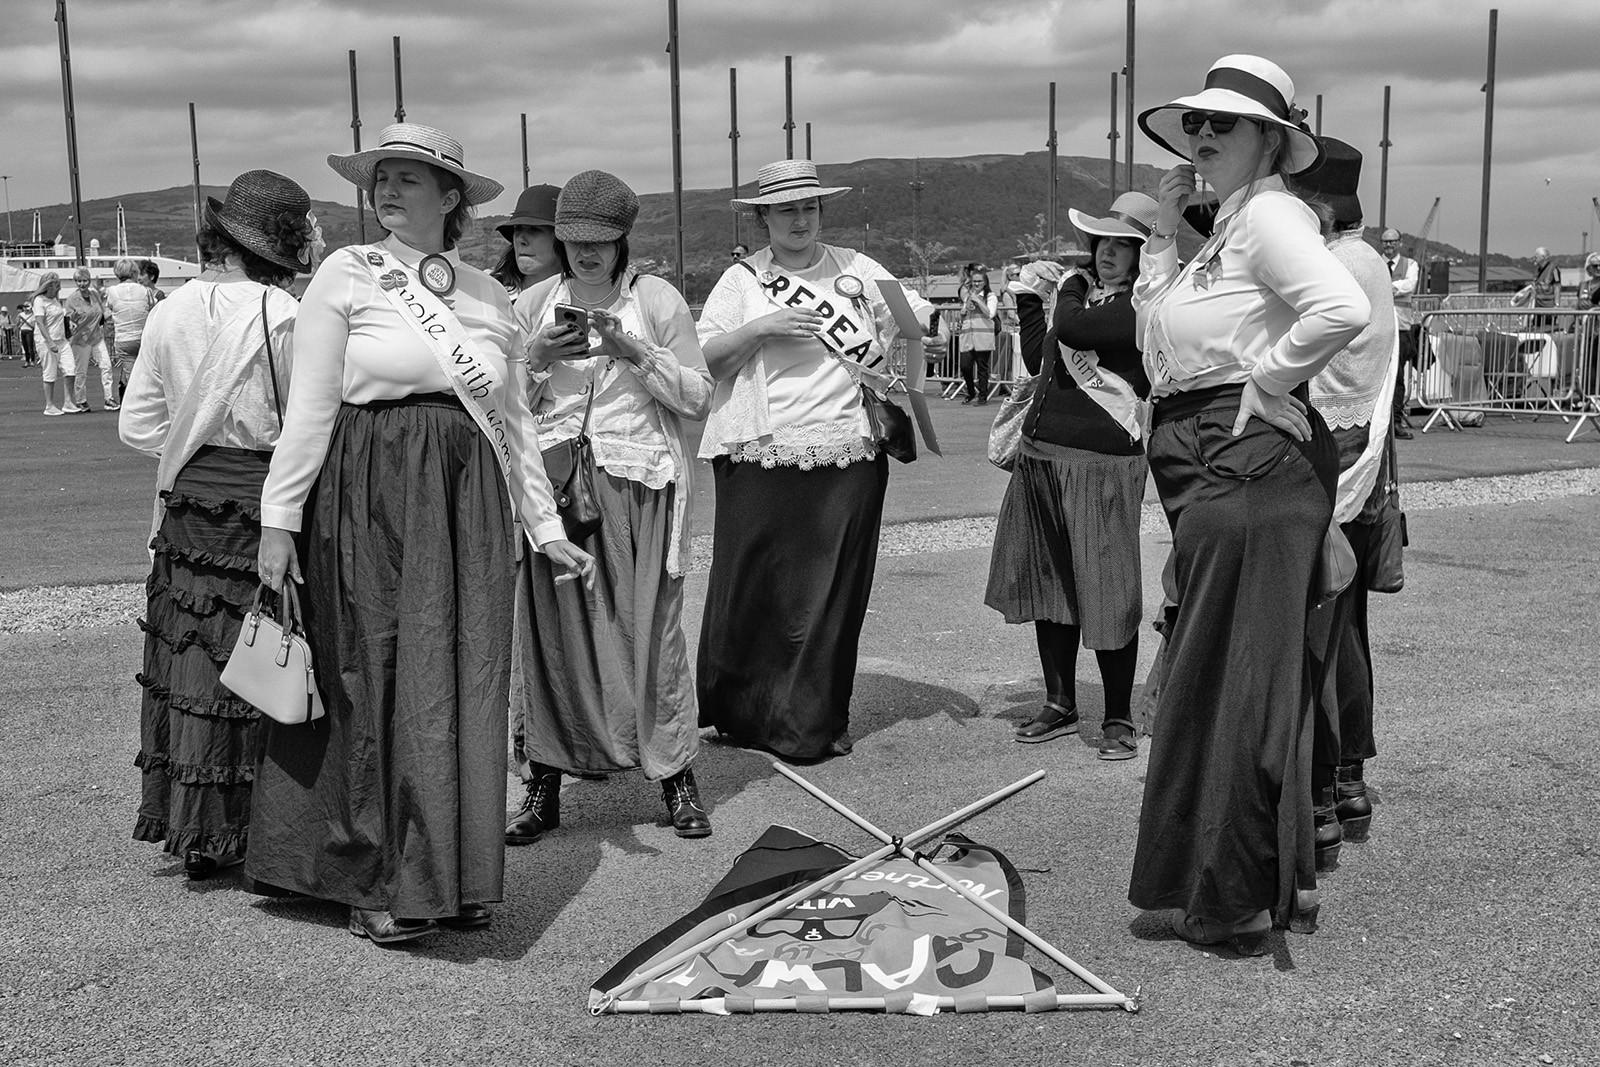 MONO - Celebrating Womans Sufferage by Glen Banna (10 marks)